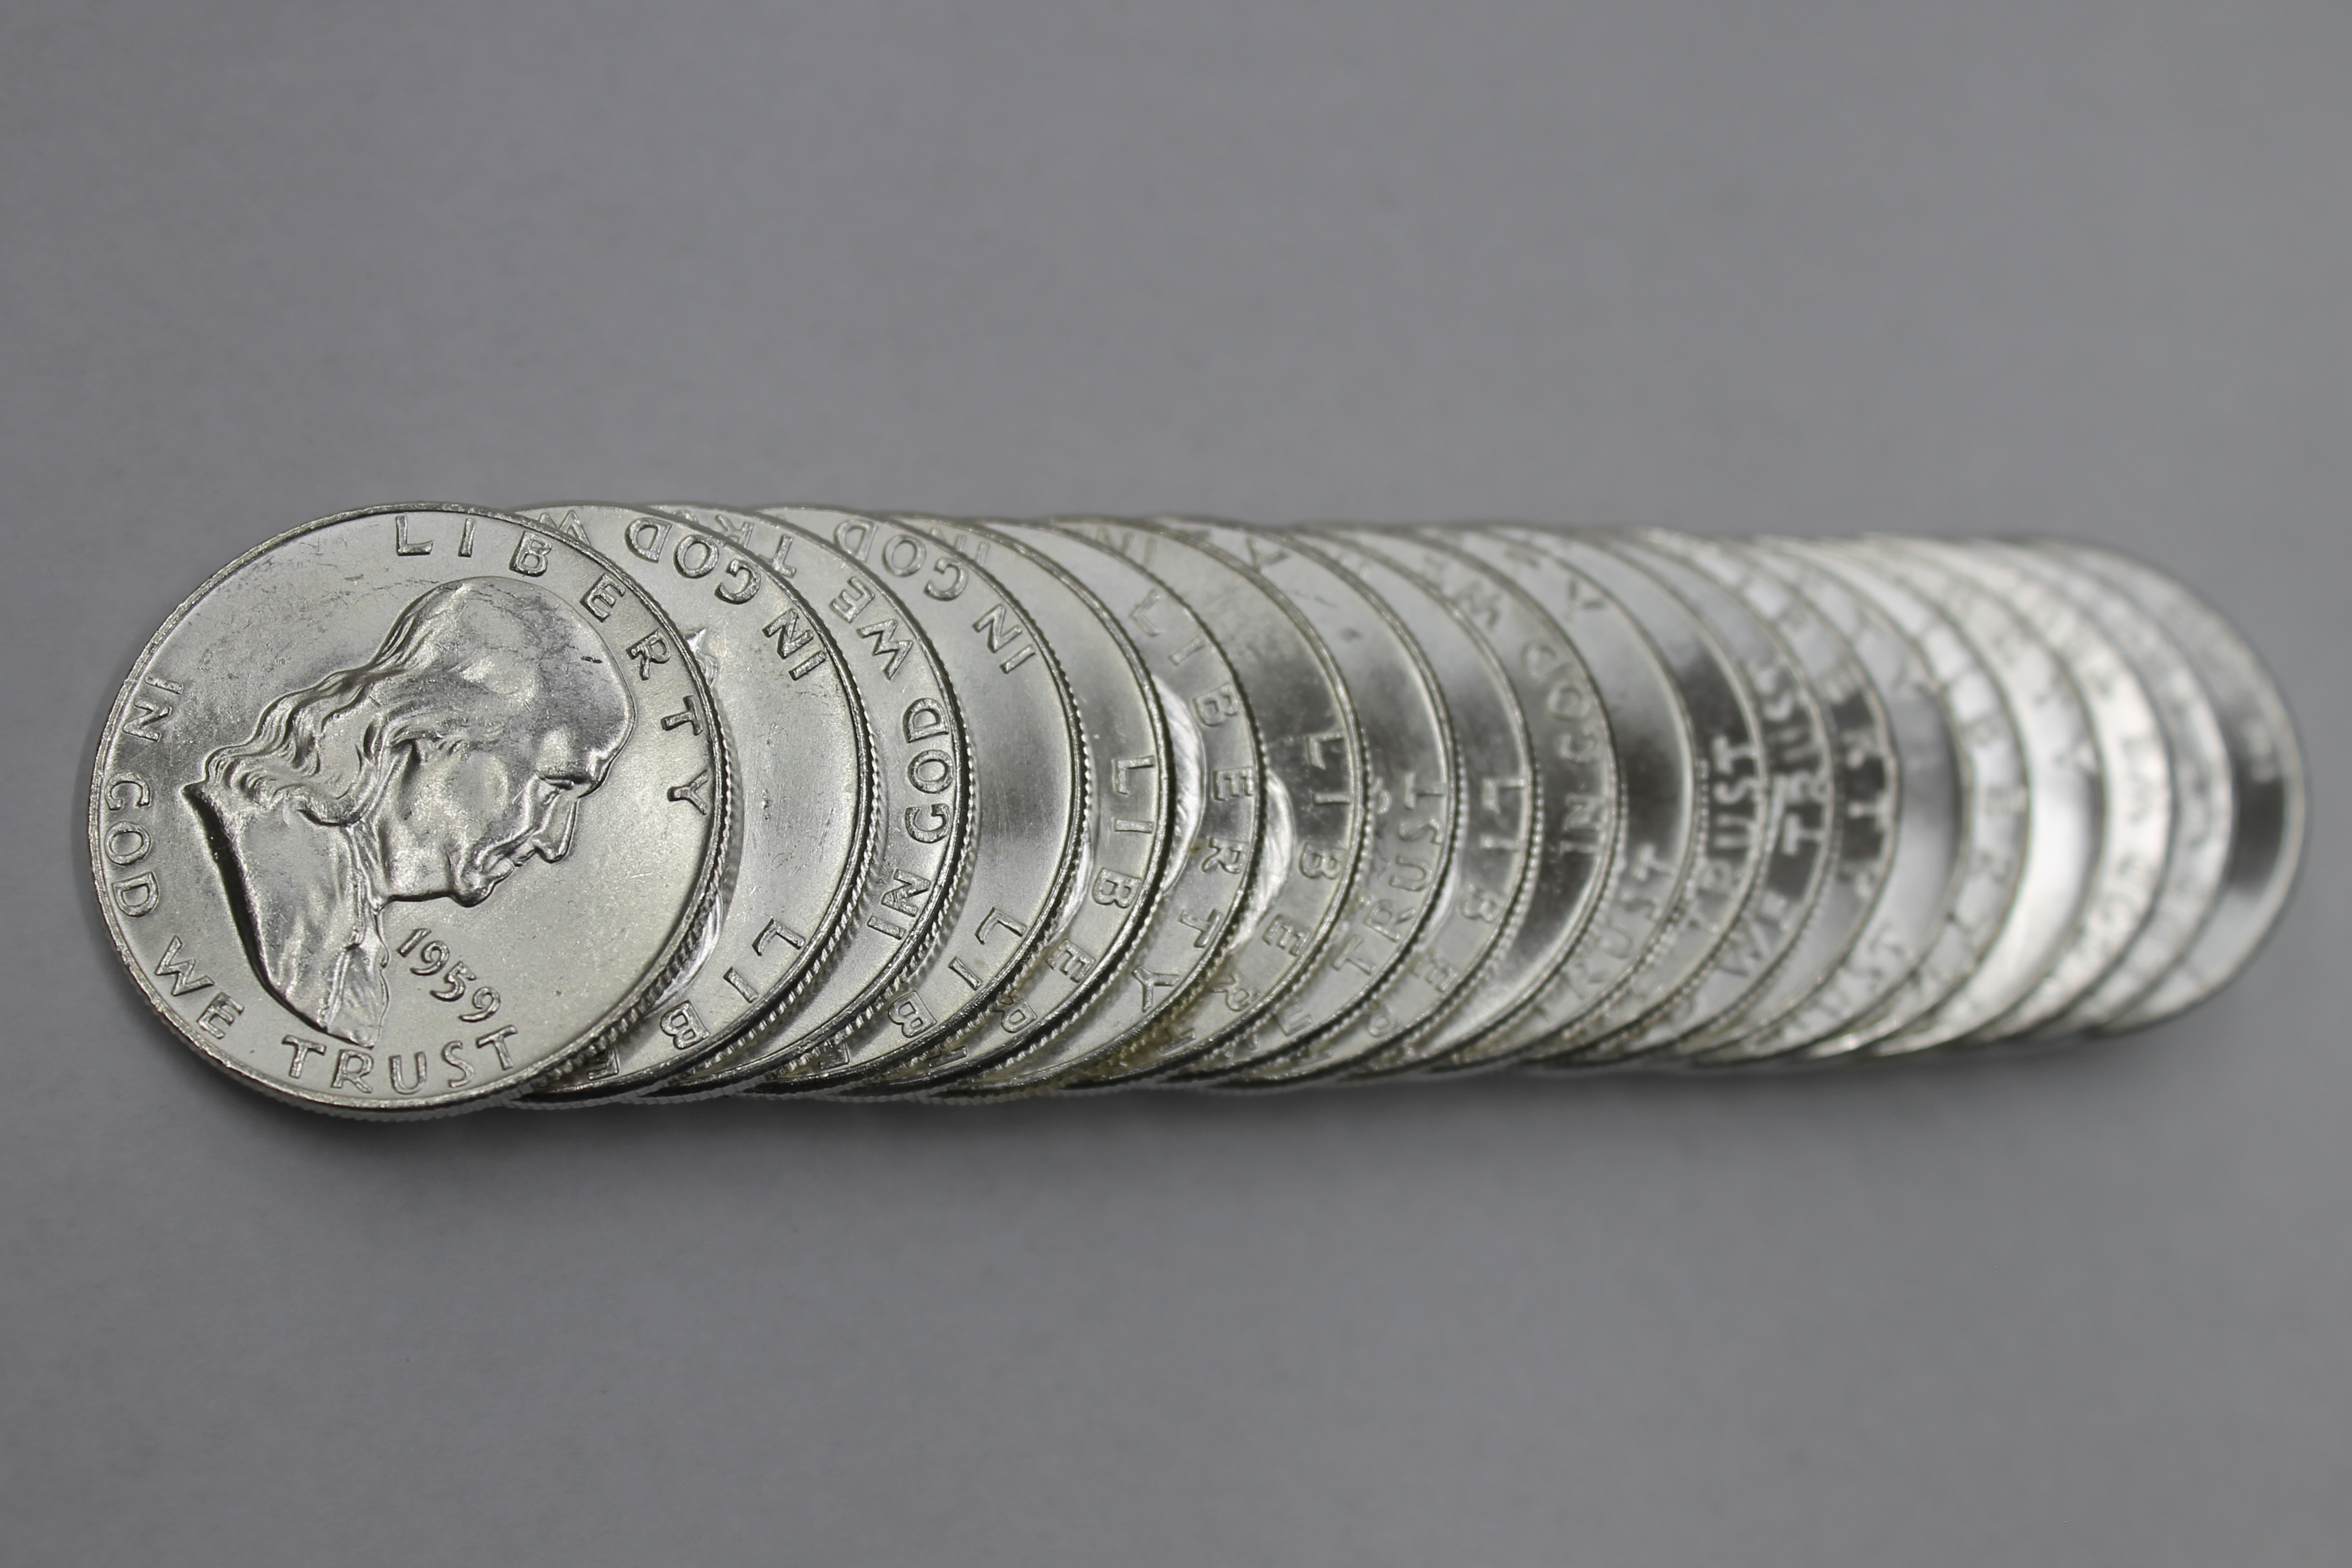 1959 P Franklin Half Dollar Roll